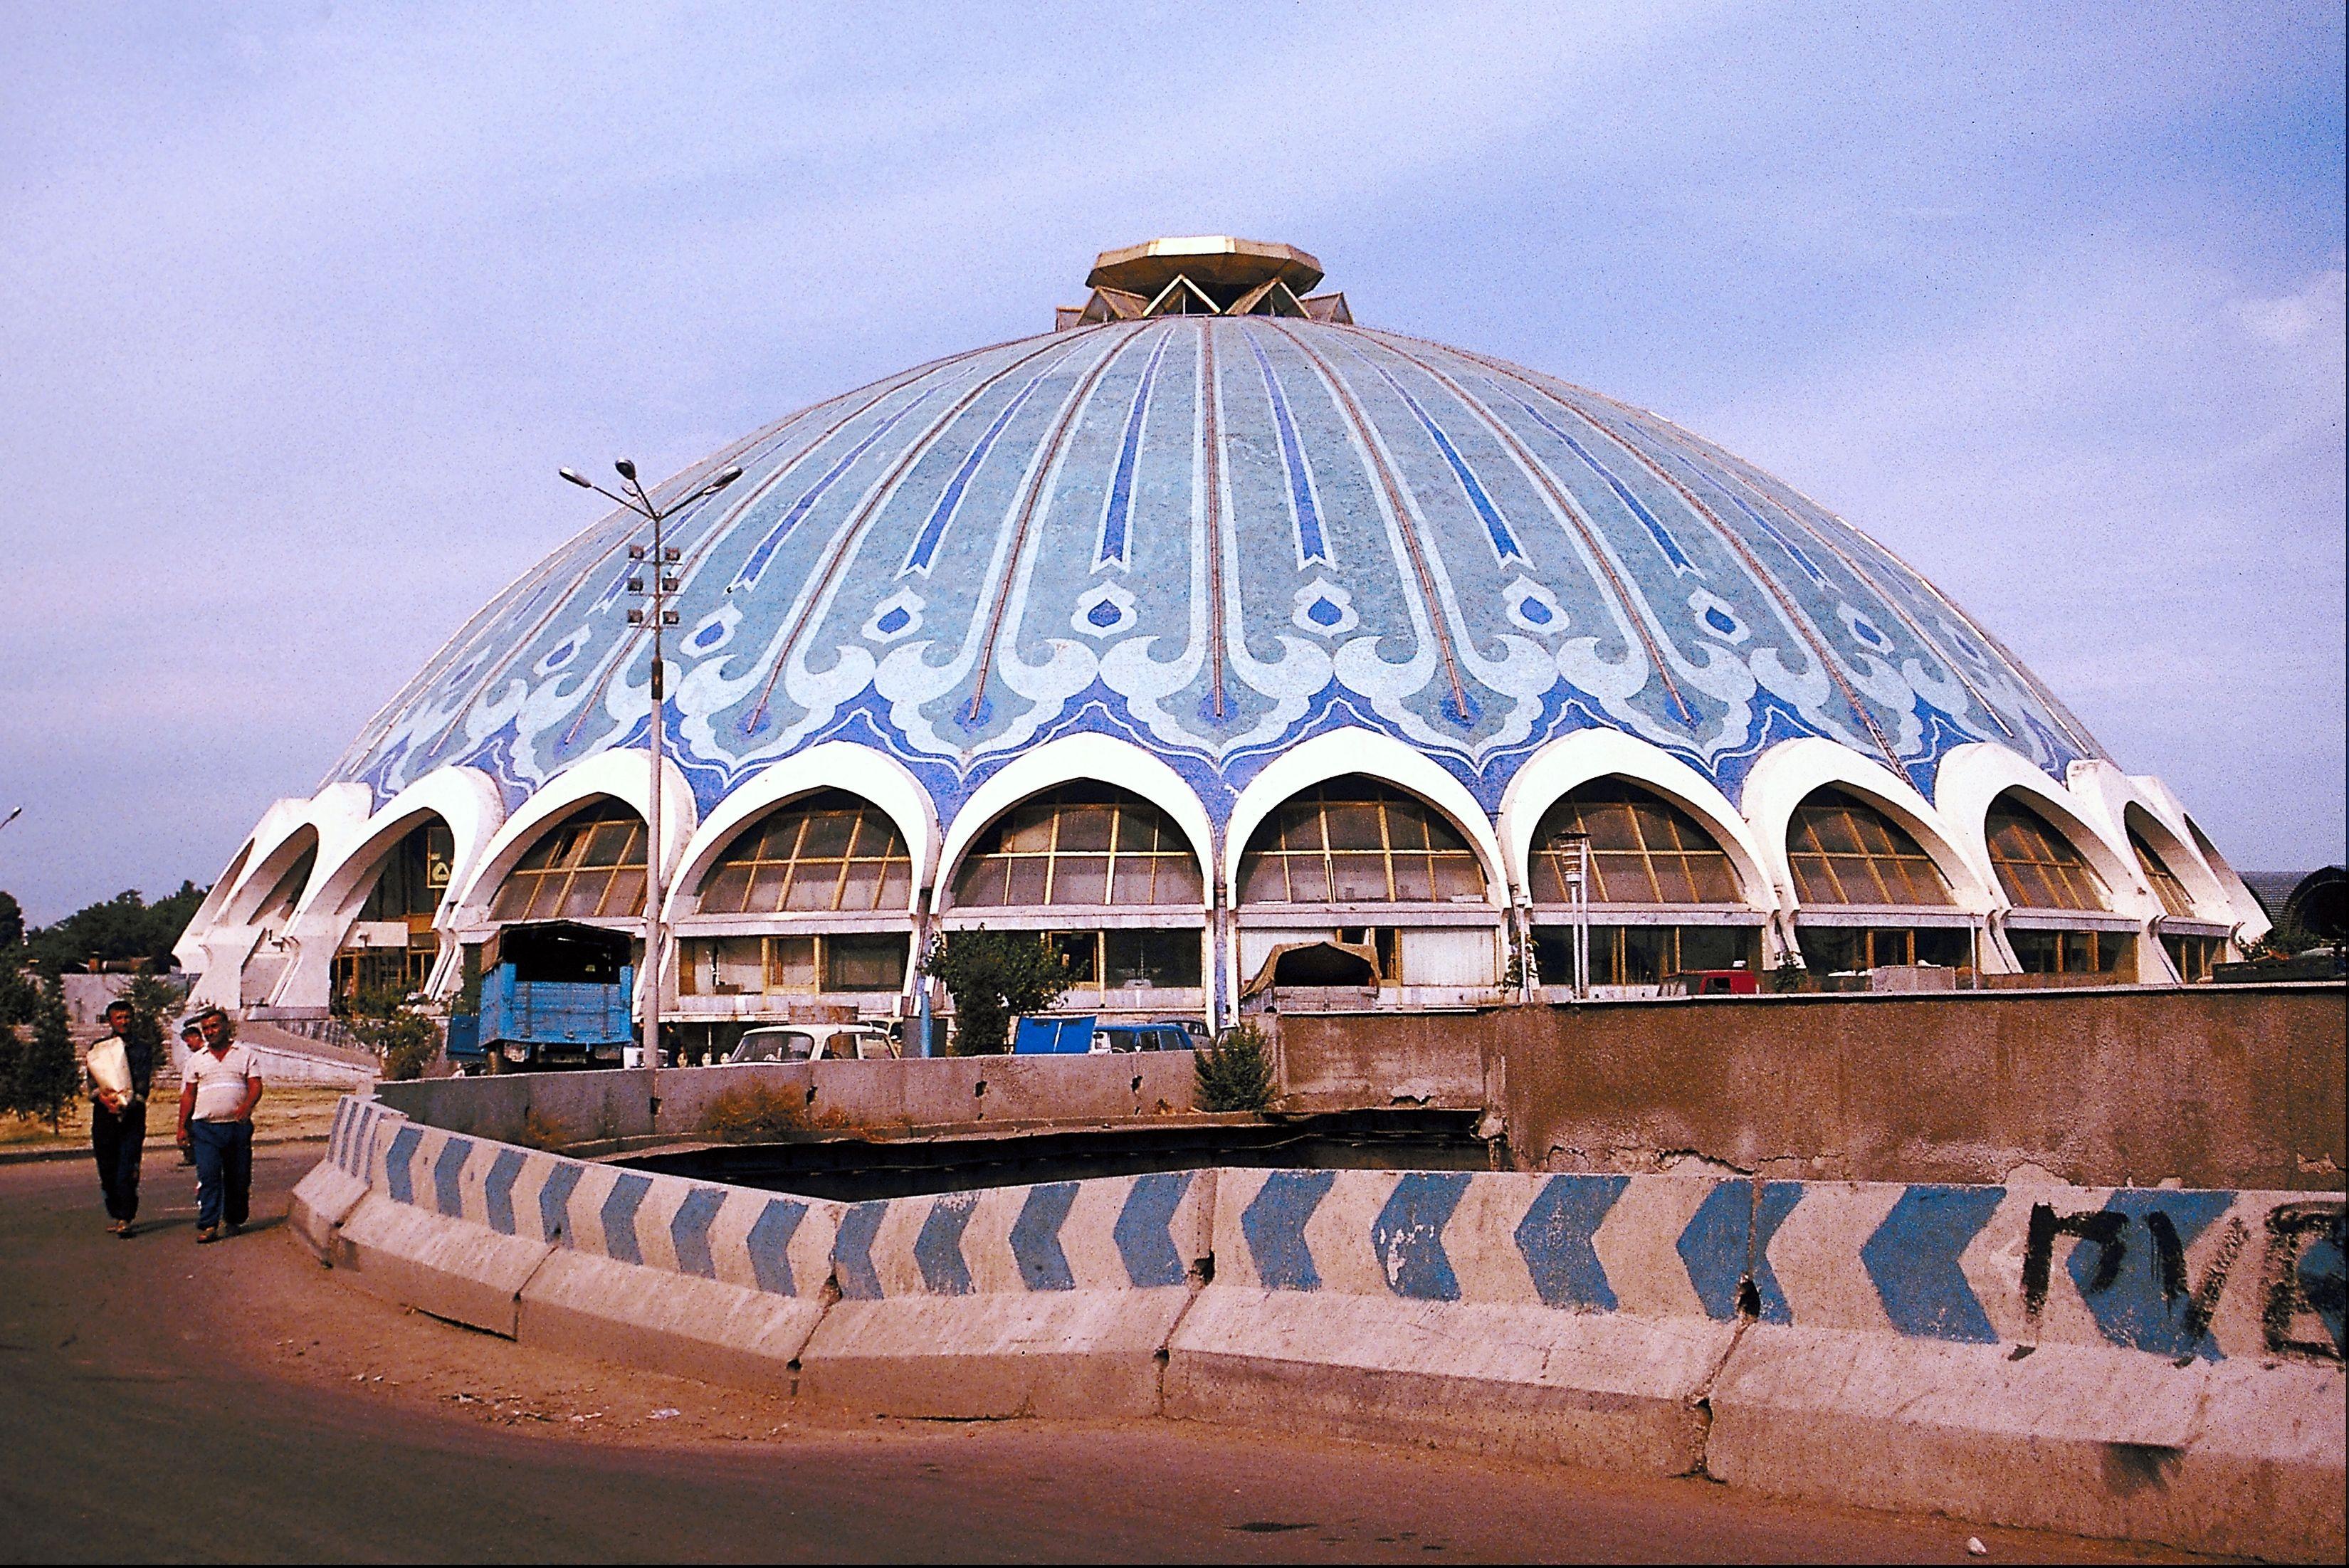 Dome, Uzbekistan